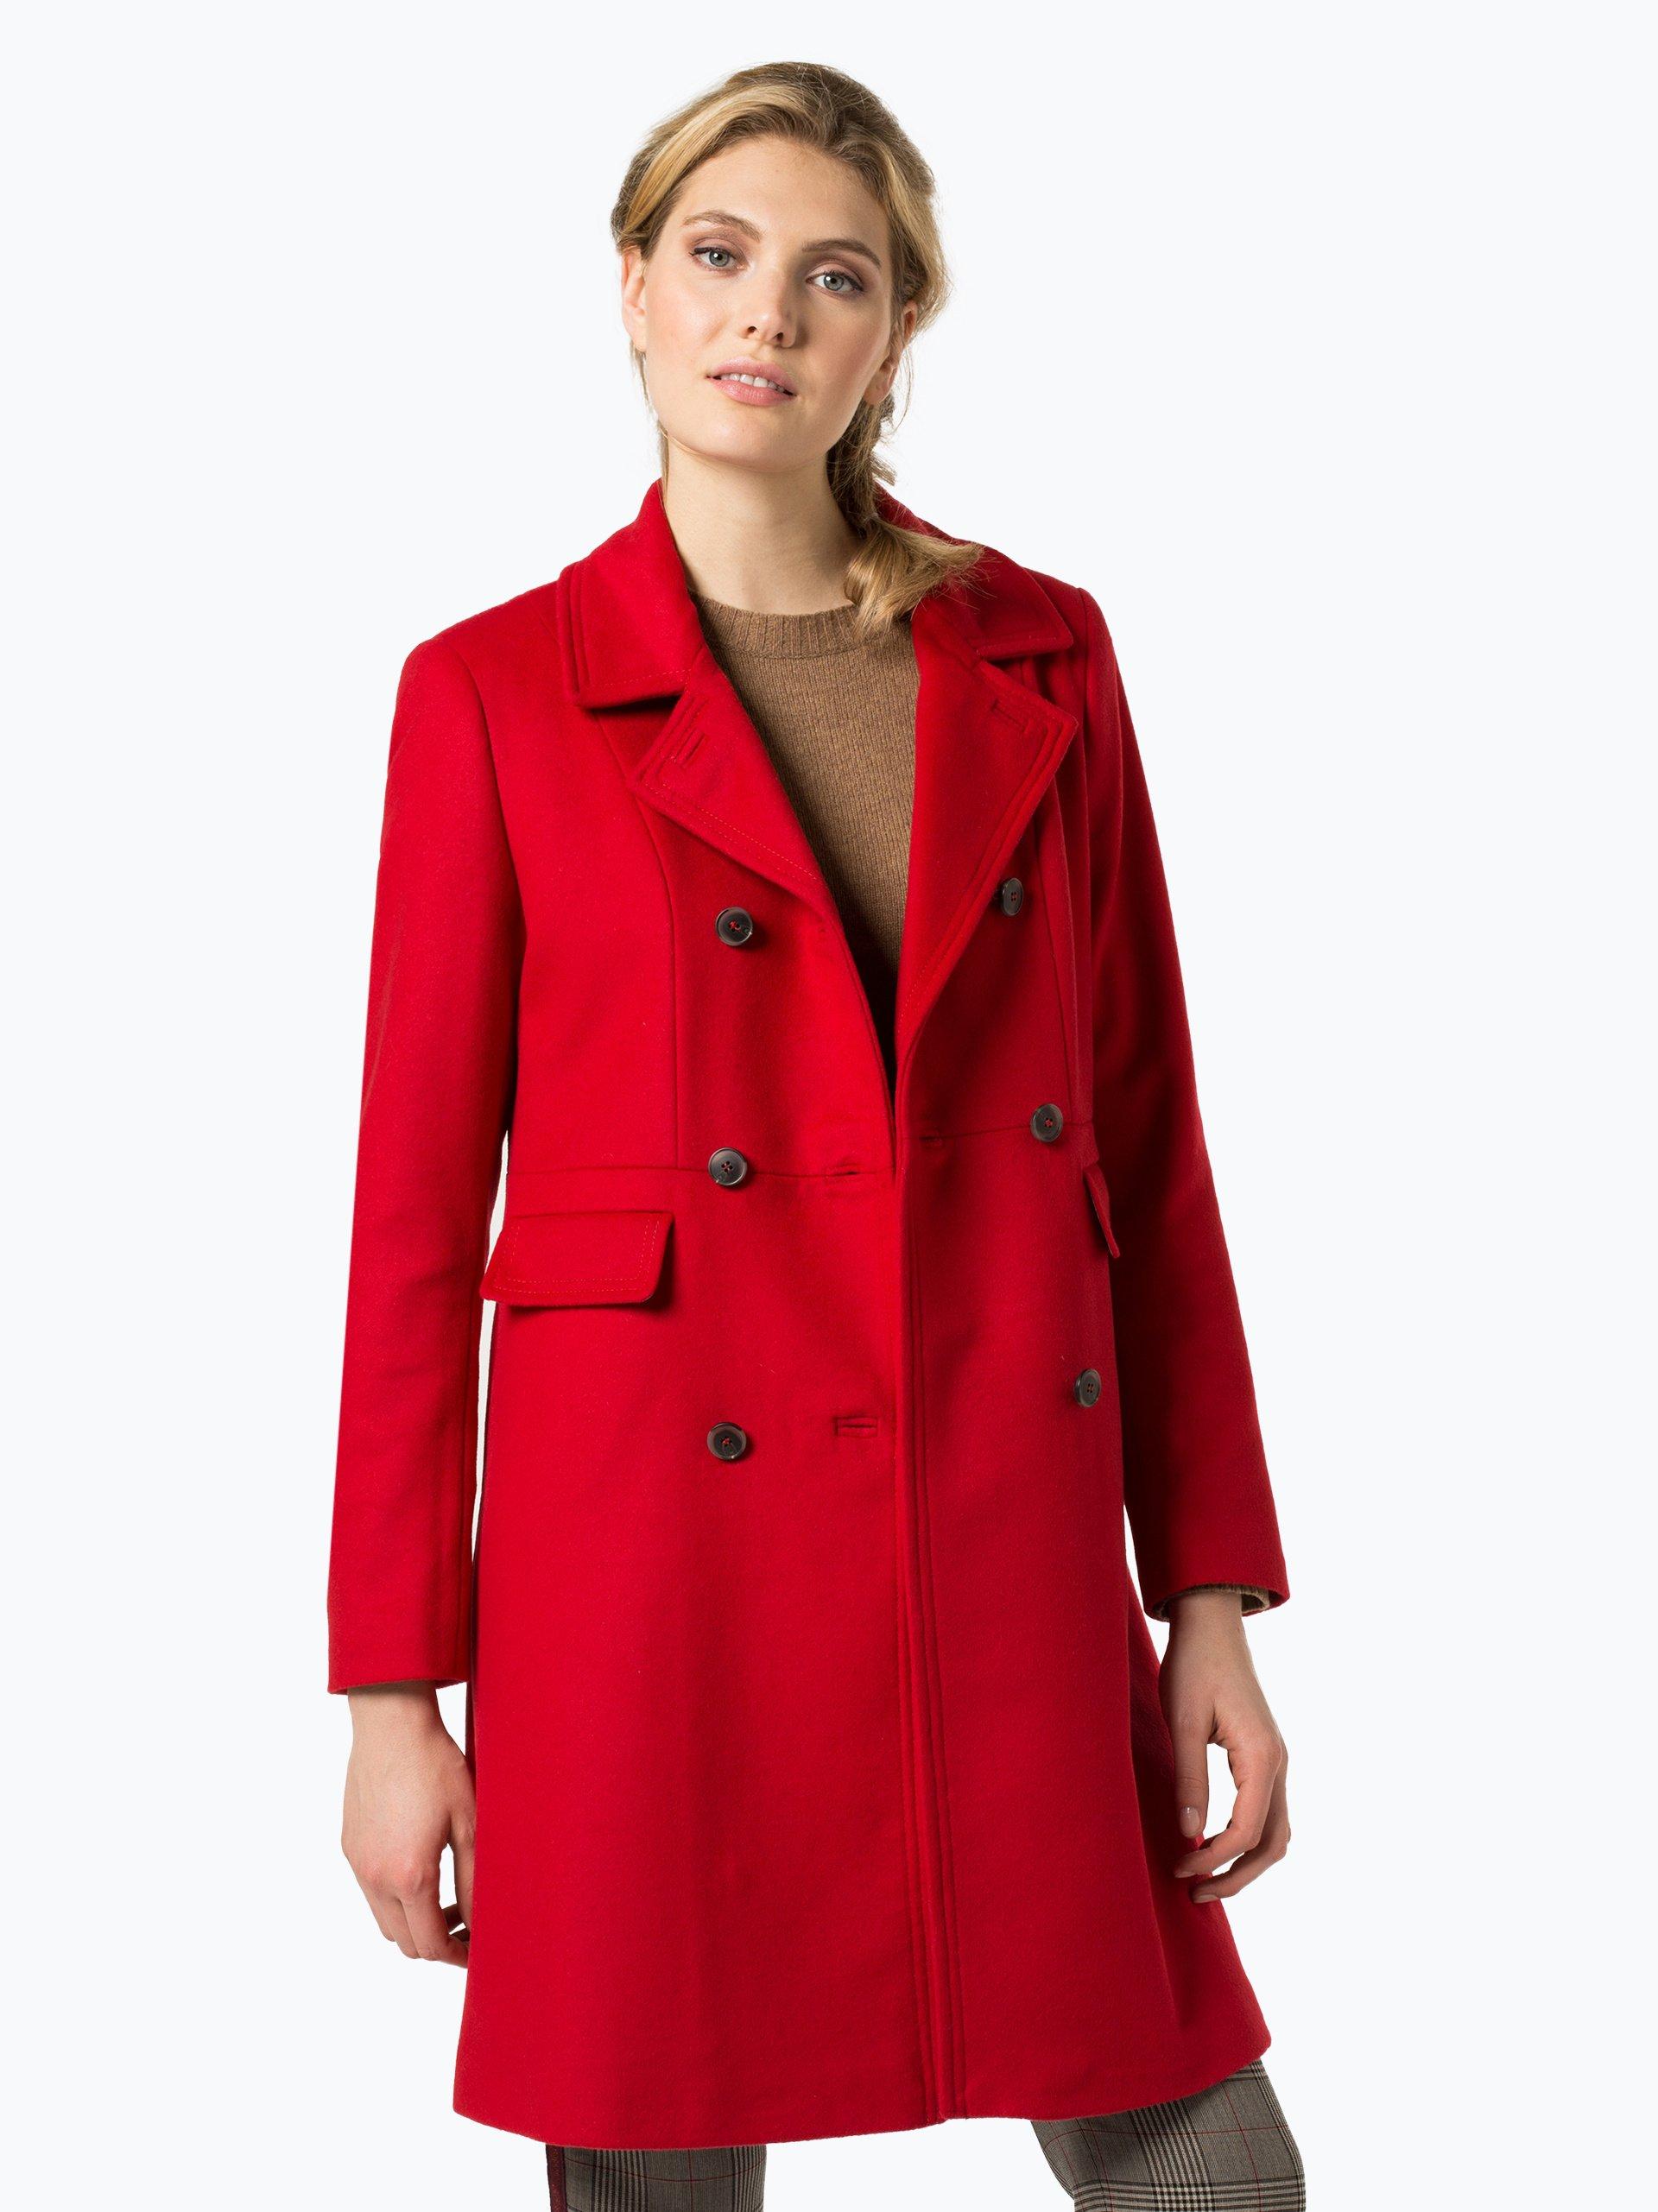 cinque damen mantel mit cashmere anteil tessla rot uni online kaufen vangraaf com. Black Bedroom Furniture Sets. Home Design Ideas